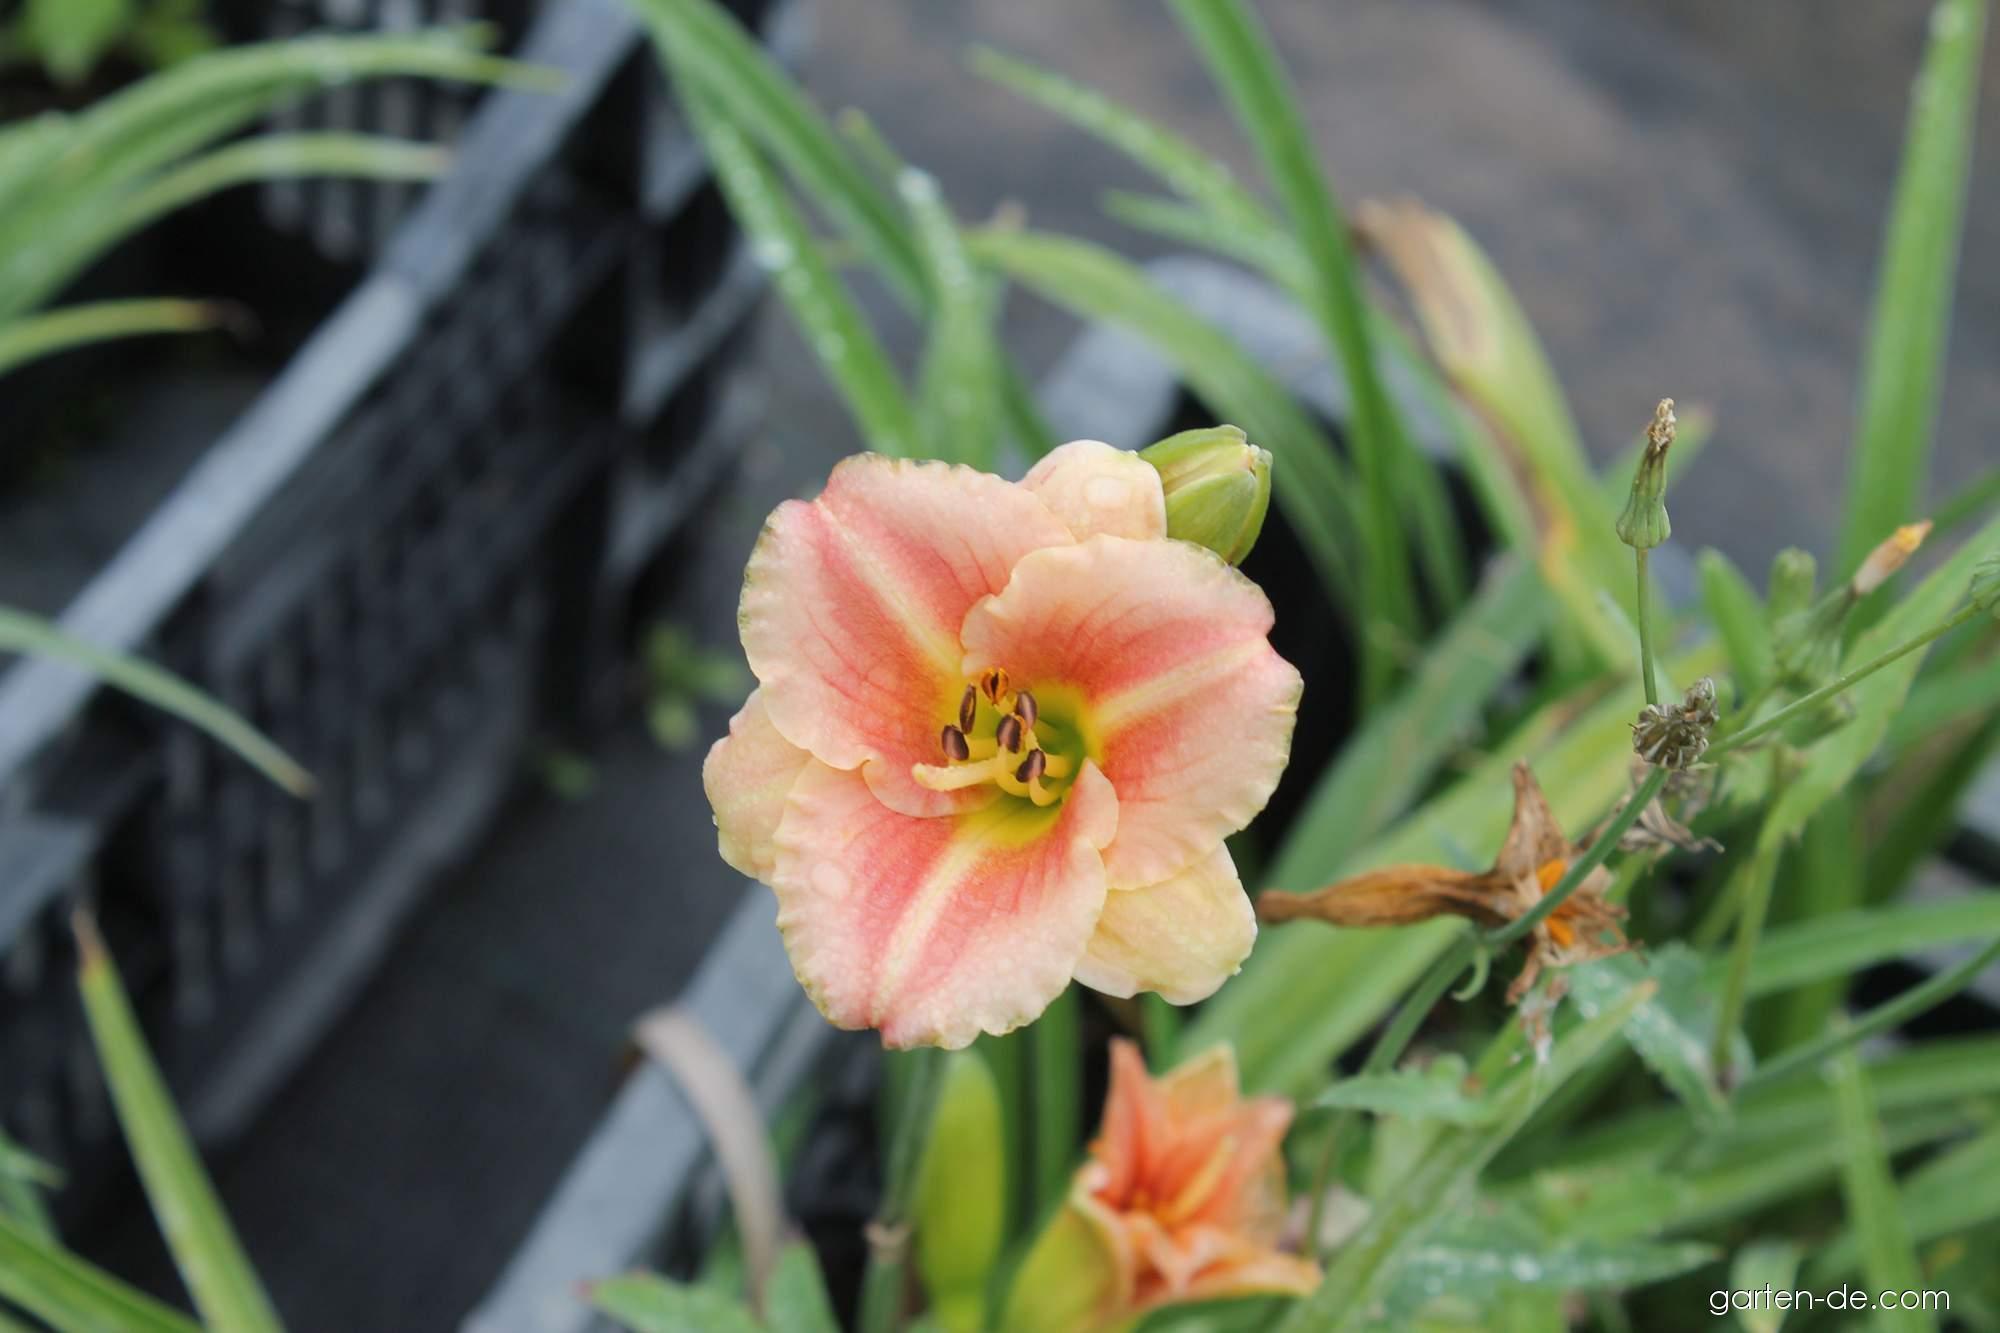 Taglilie - Hemerocallis Little Anna Rosa